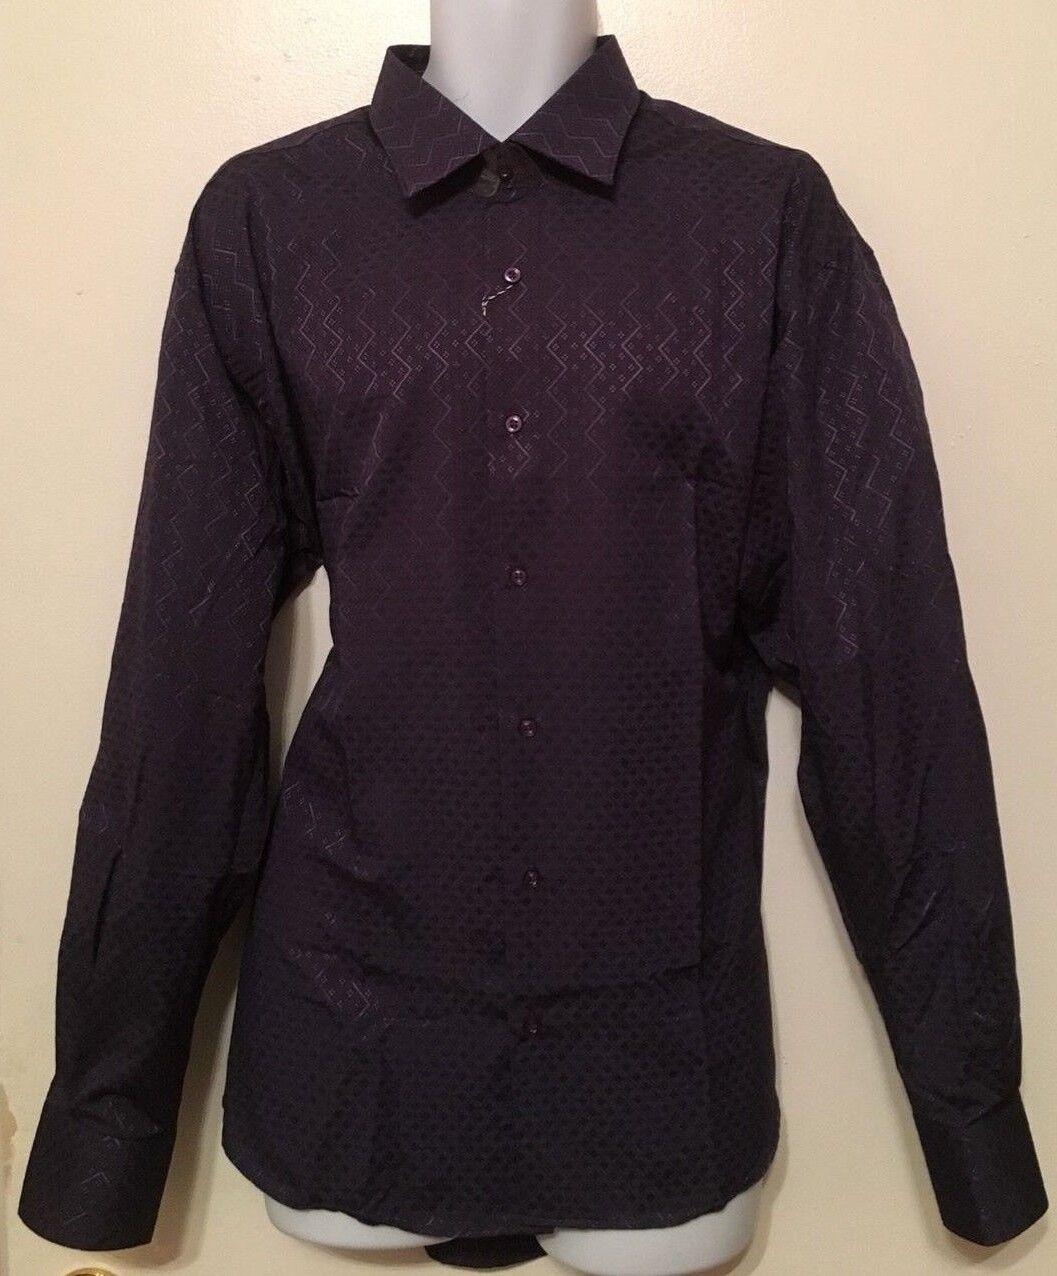 MARCELLO SPORT MEN DARK PURPLE DRESS SHIRT, SIZE L, XL.